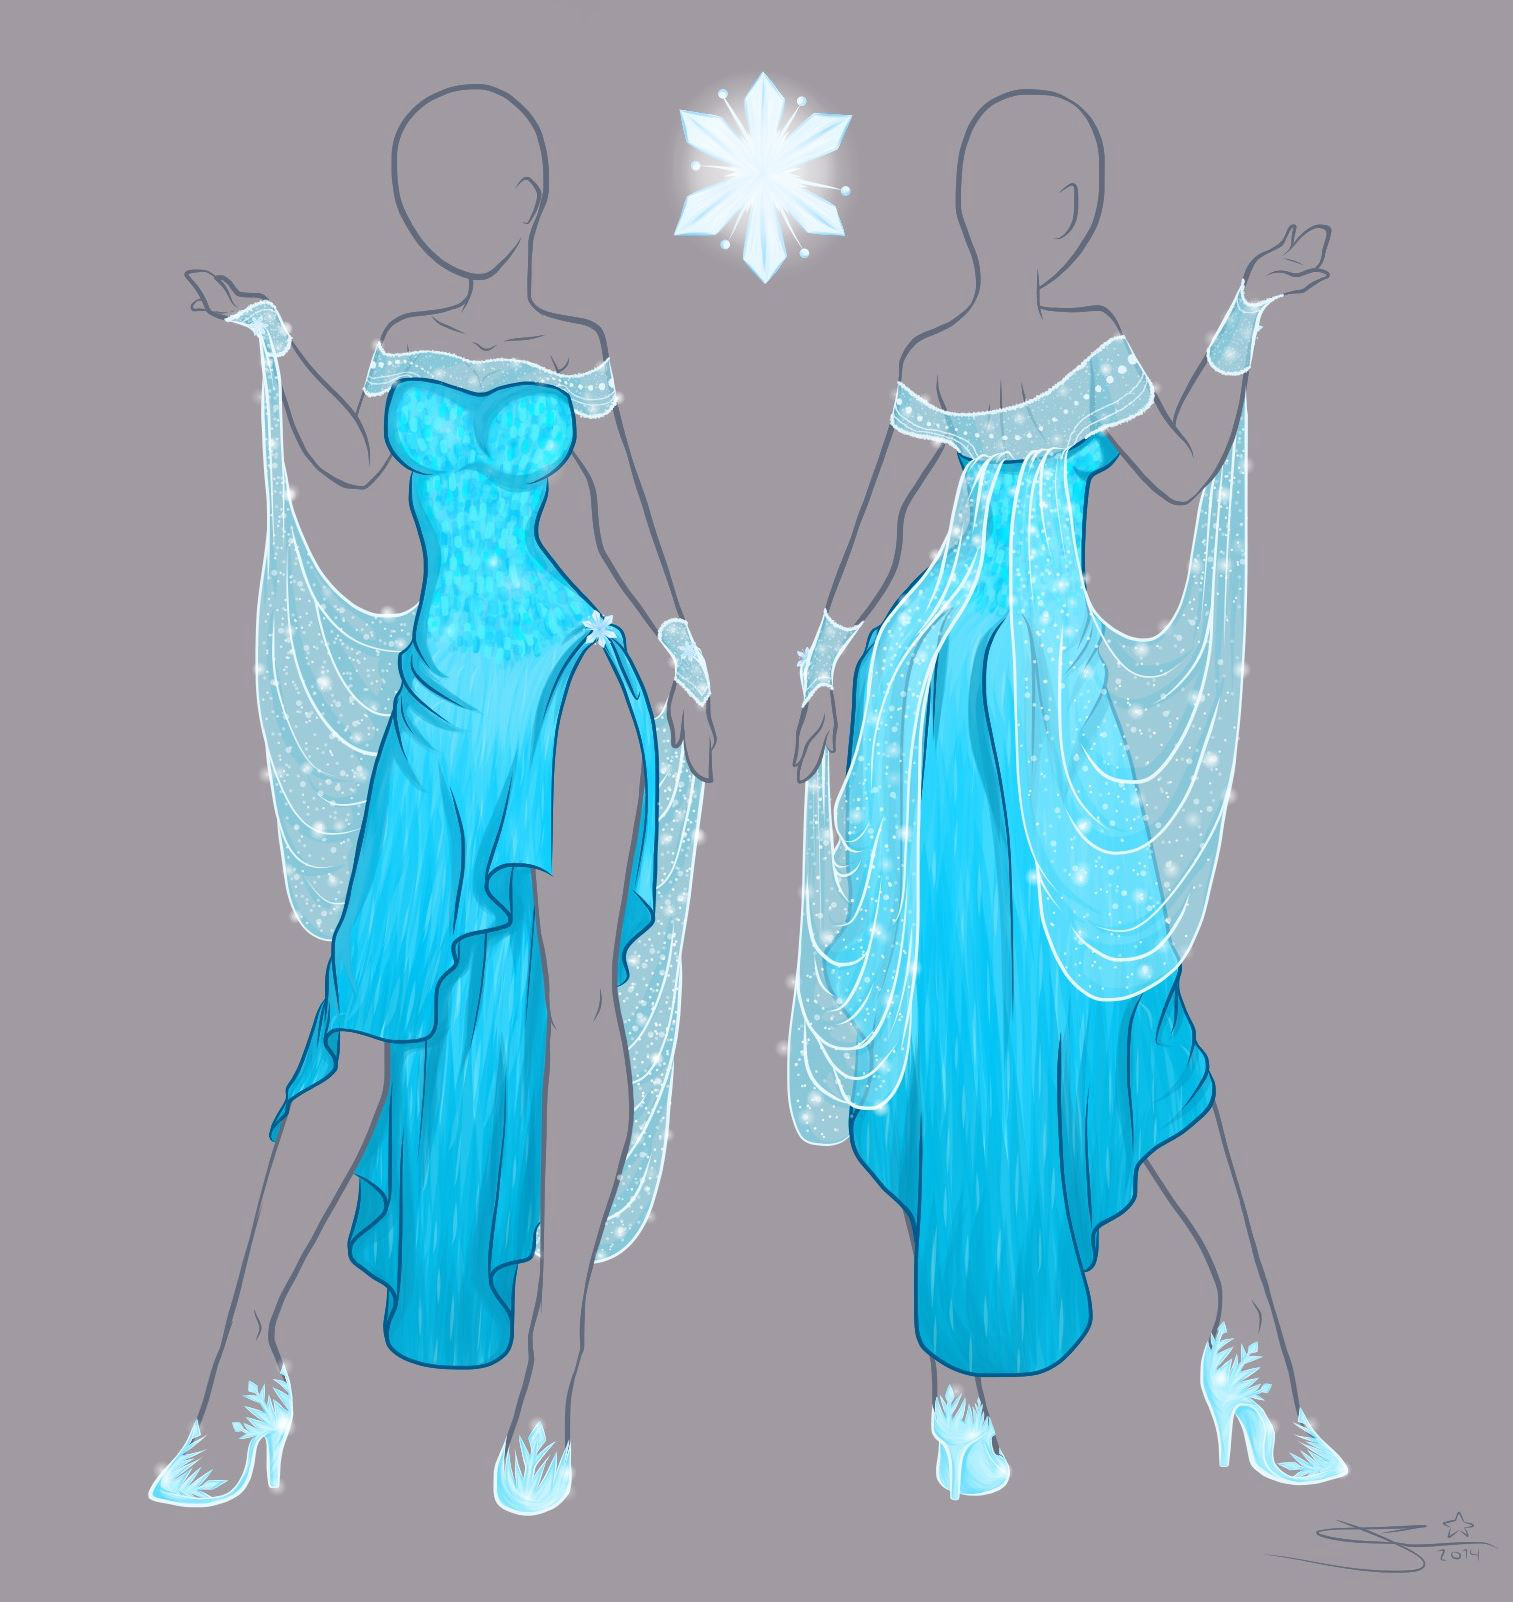 c35656787e7a1 Frozen Elsa - new dress by Tatara94.deviantart.com on @deviantART. Pretty